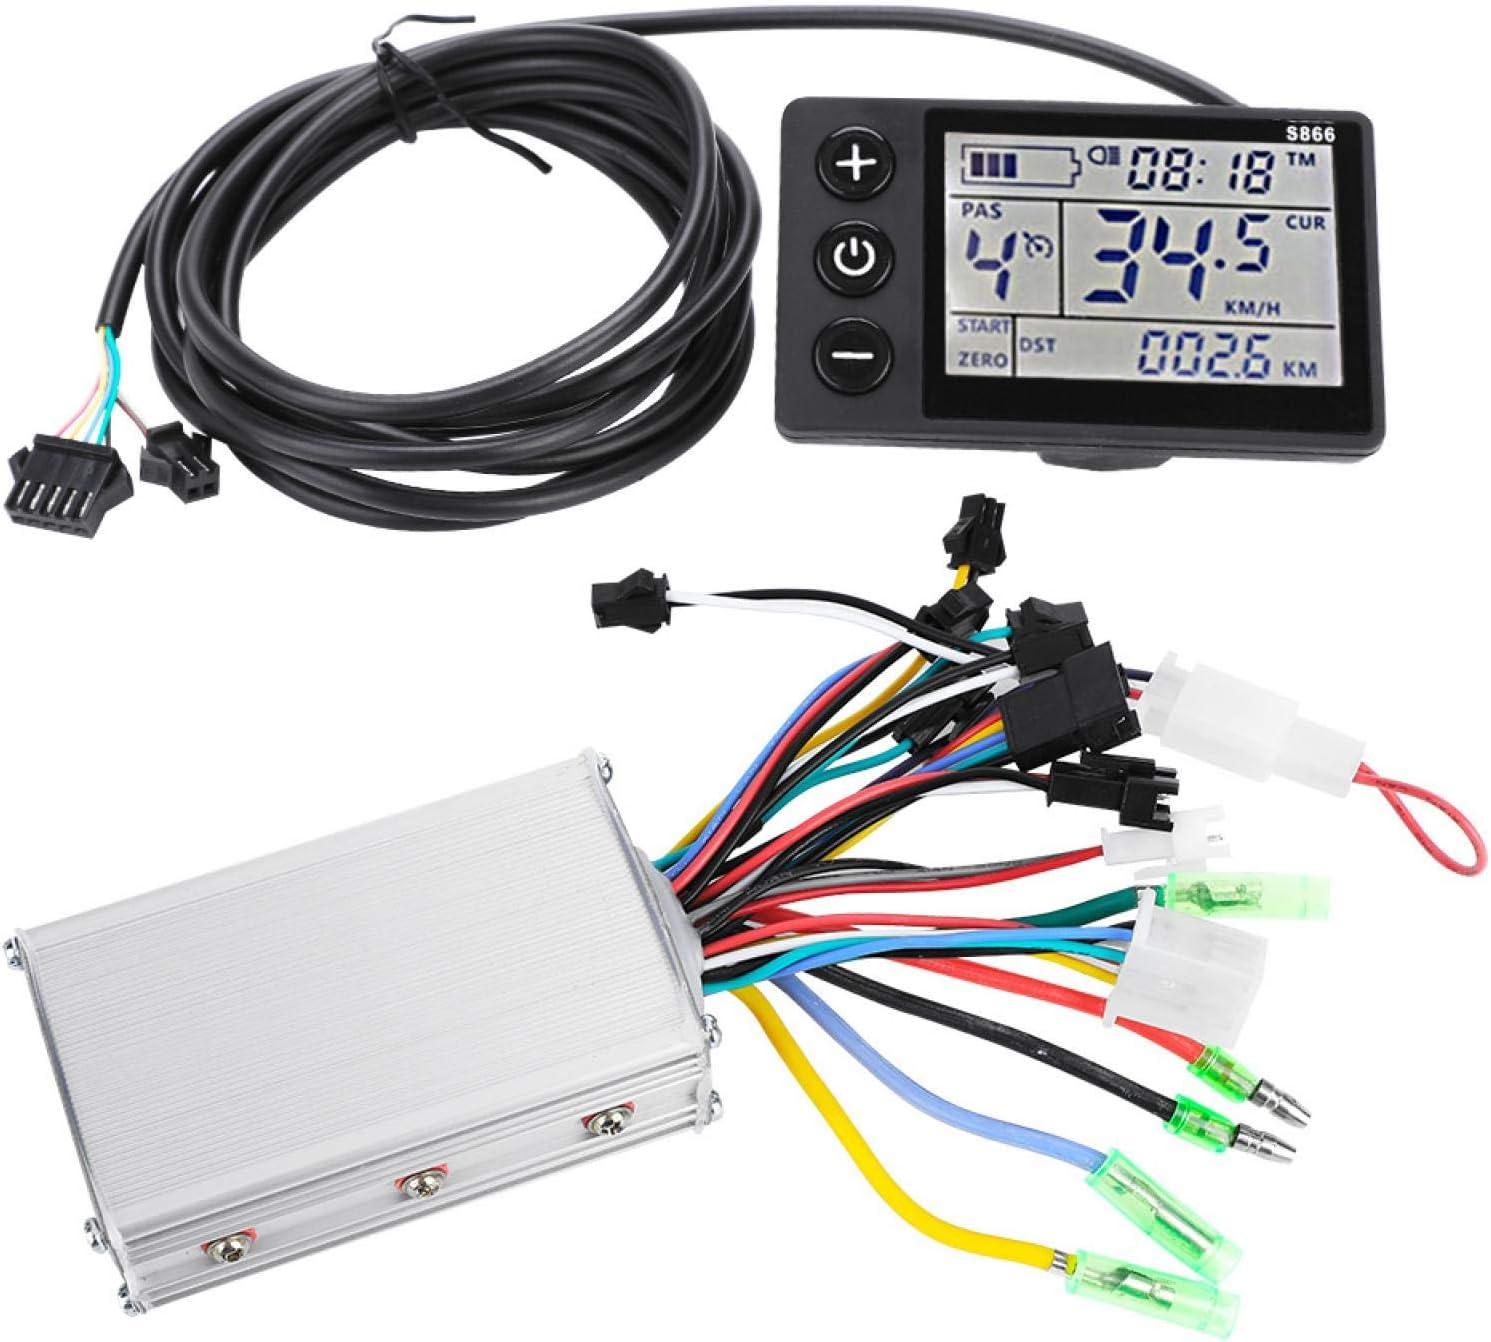 Eatbuy Controlador de Motor - 24V-48V Panel de Pantalla LCD Impermeable Kit de Controlador sin escobillas para Scooter de Bicicleta eléctrica(24V/36V 350W)